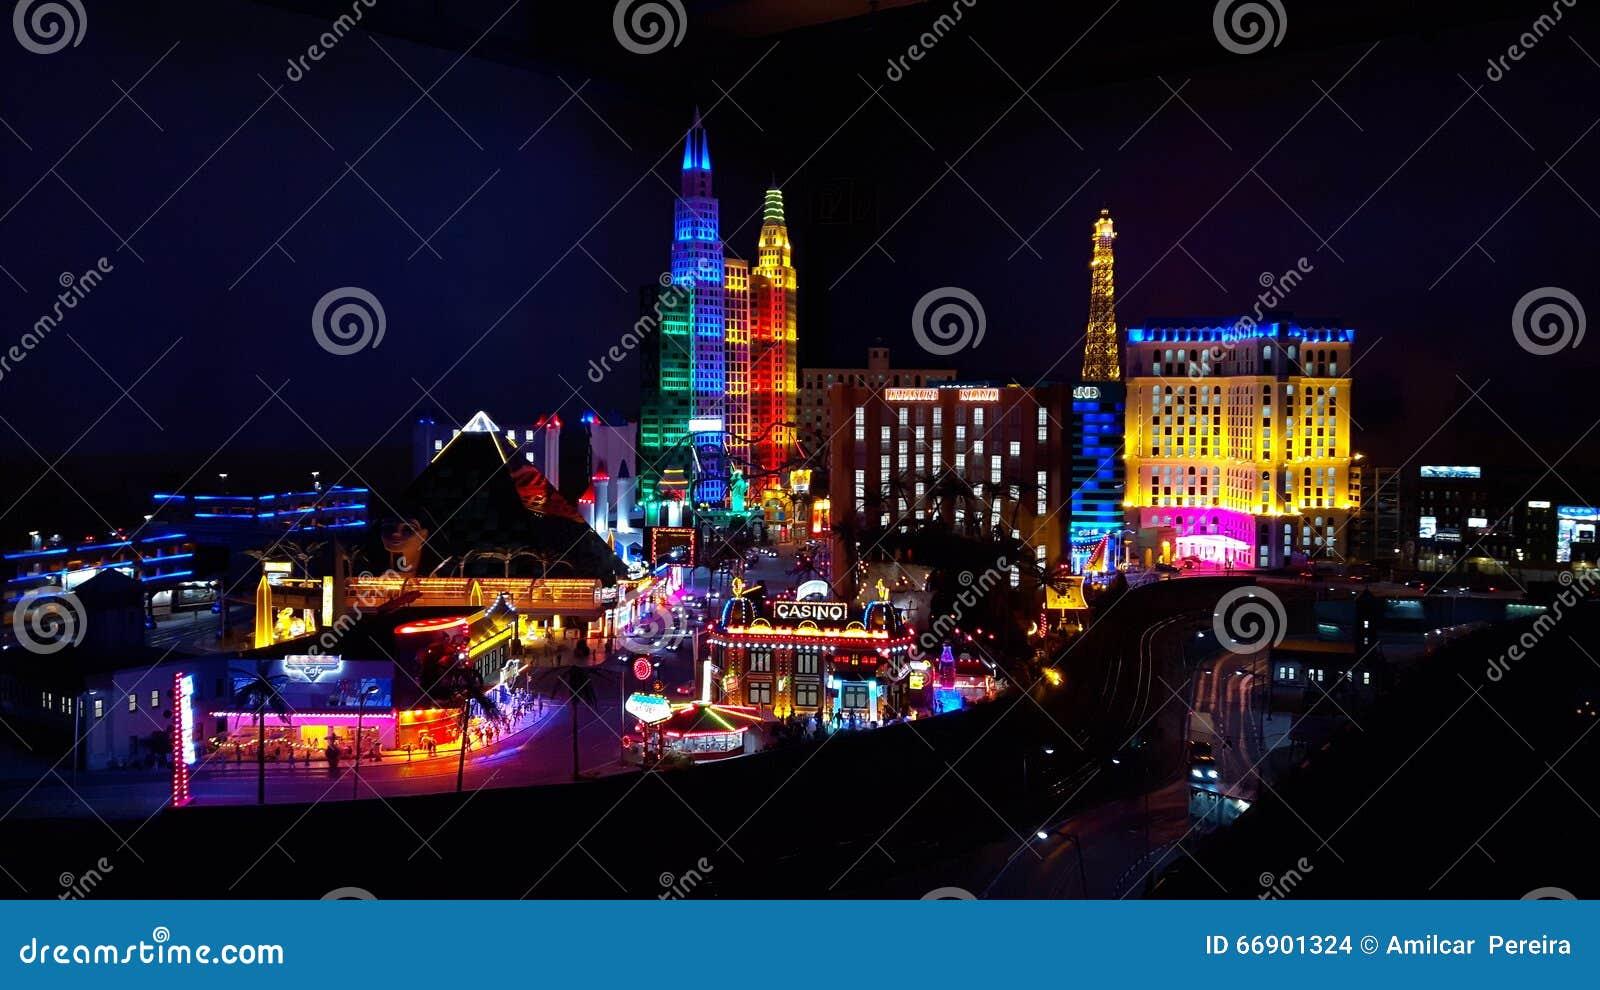 Mini Las Vegas >> Mini Las Vegas Zdjecie Stock Obraz Zlozonej Z Hamburger 66901324